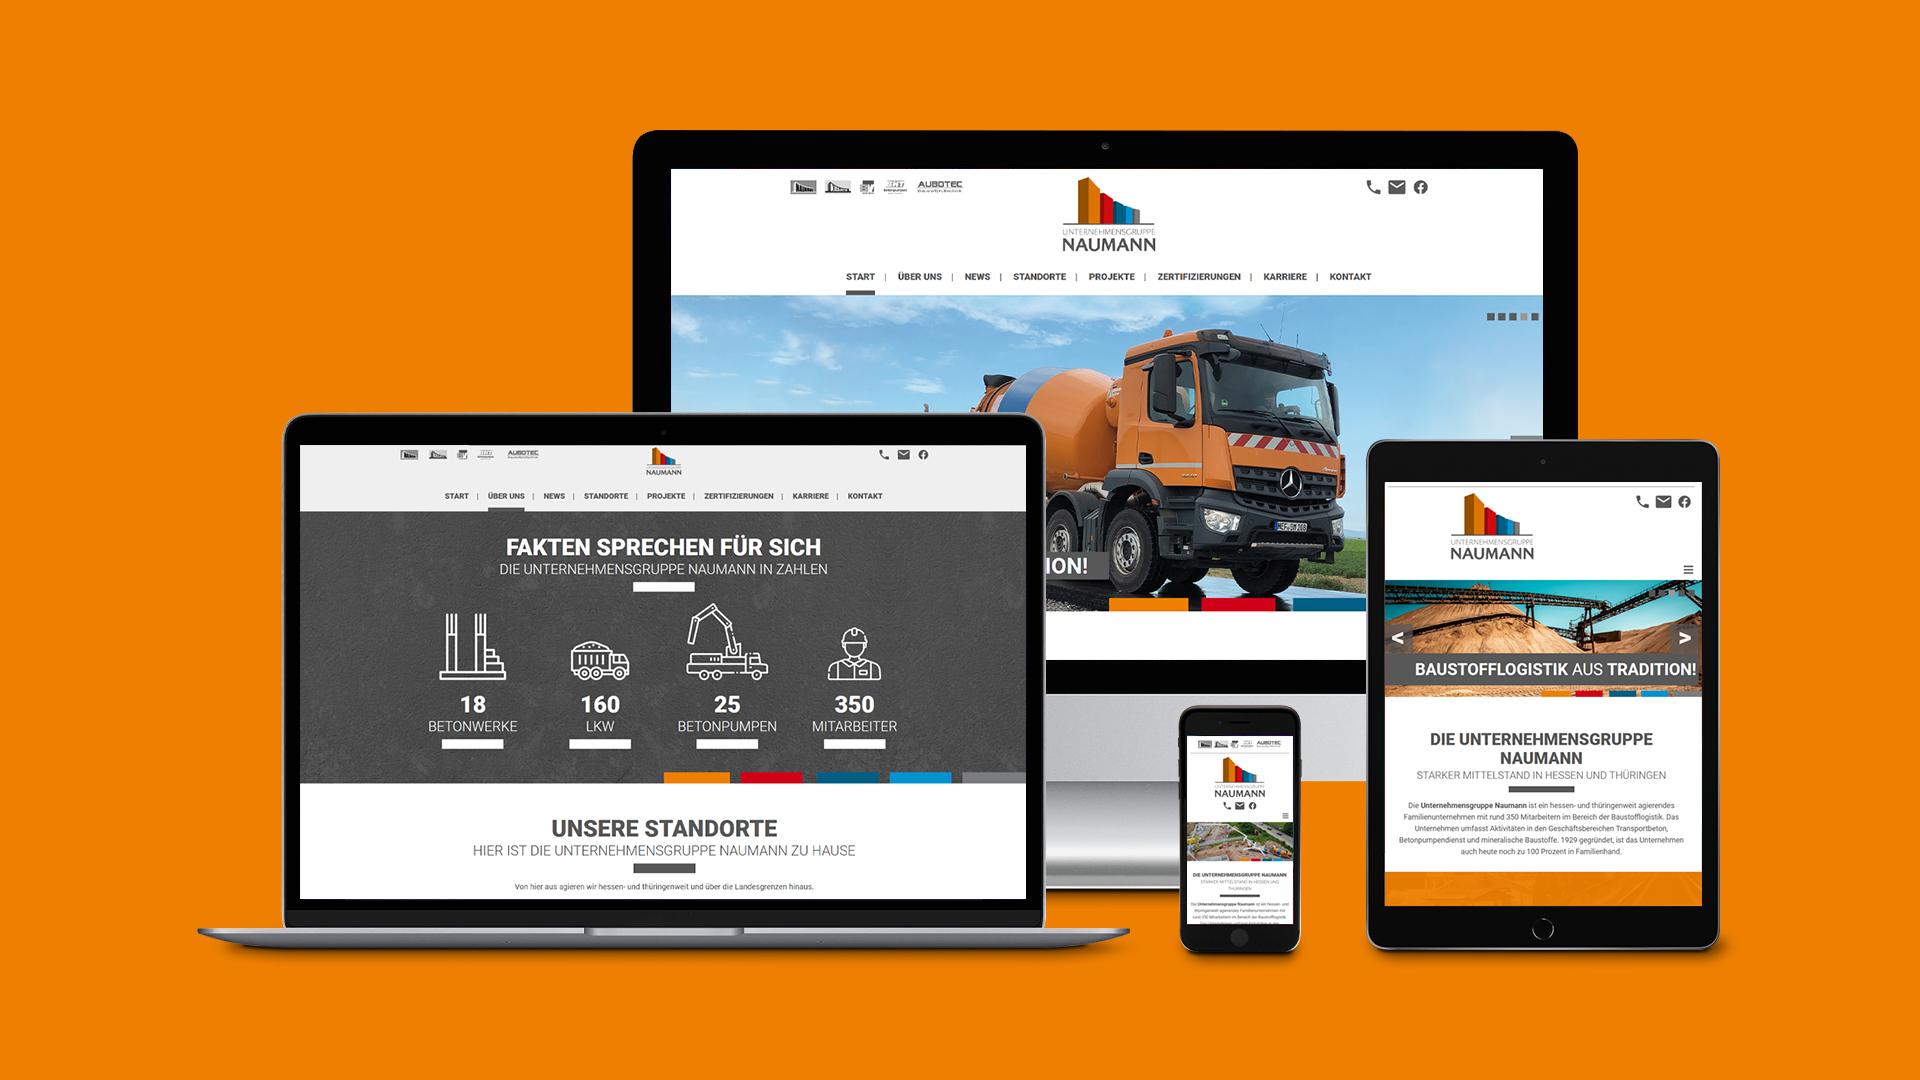 Webdesign – Unternehmensgruppe Naumann